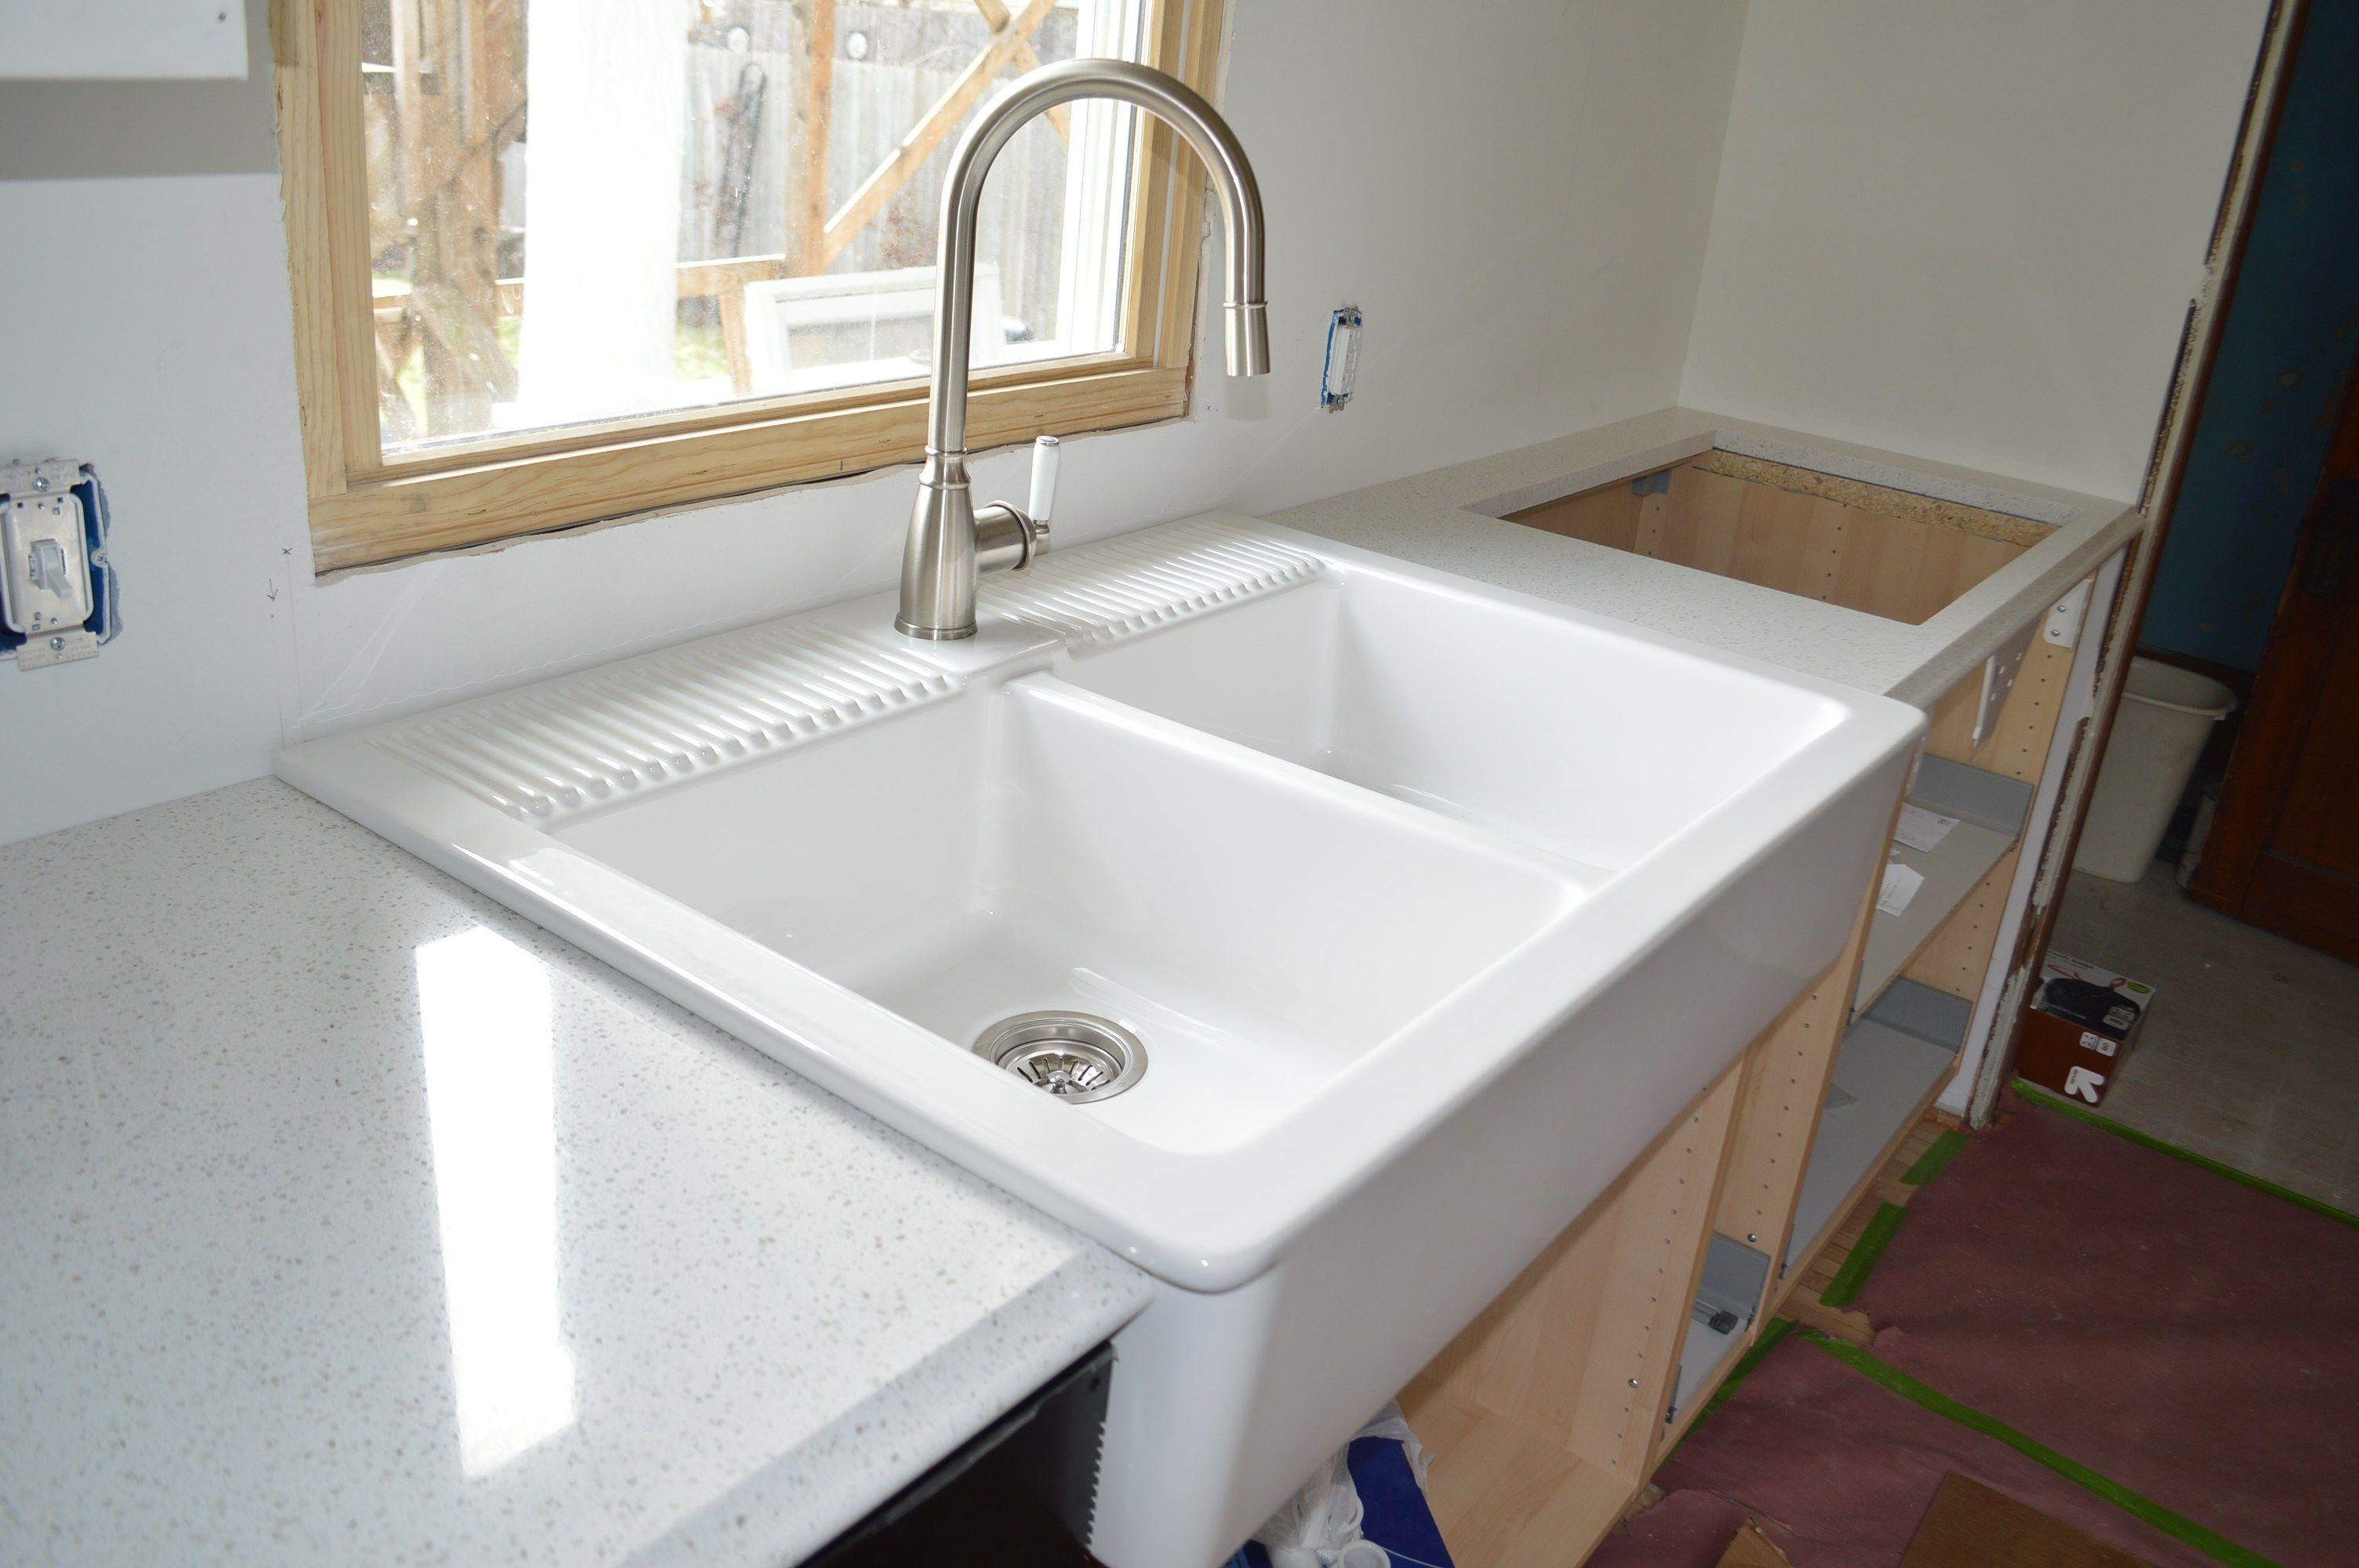 Ordering Installing Quartz Countertops From Menards Ikea Farmhouse Sink Quartz Countertops Kitchen Cabinets And Countertops